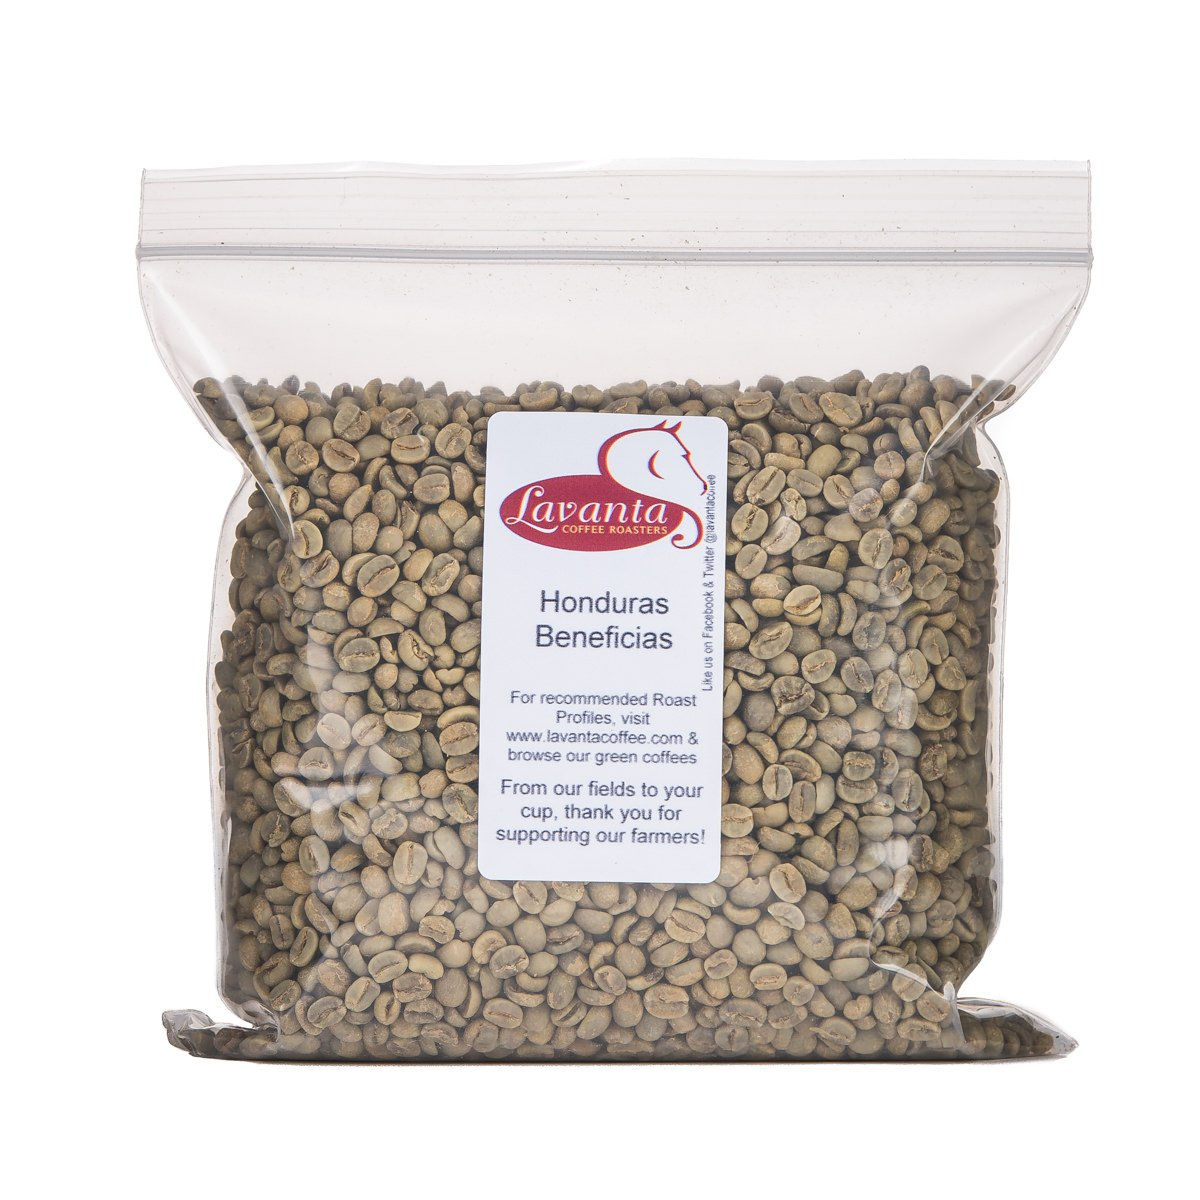 Lavanta Coffee Roasters Honduras Beneficia Santa Rosa SHG EP Green Direct Trade Coffee, 2lb